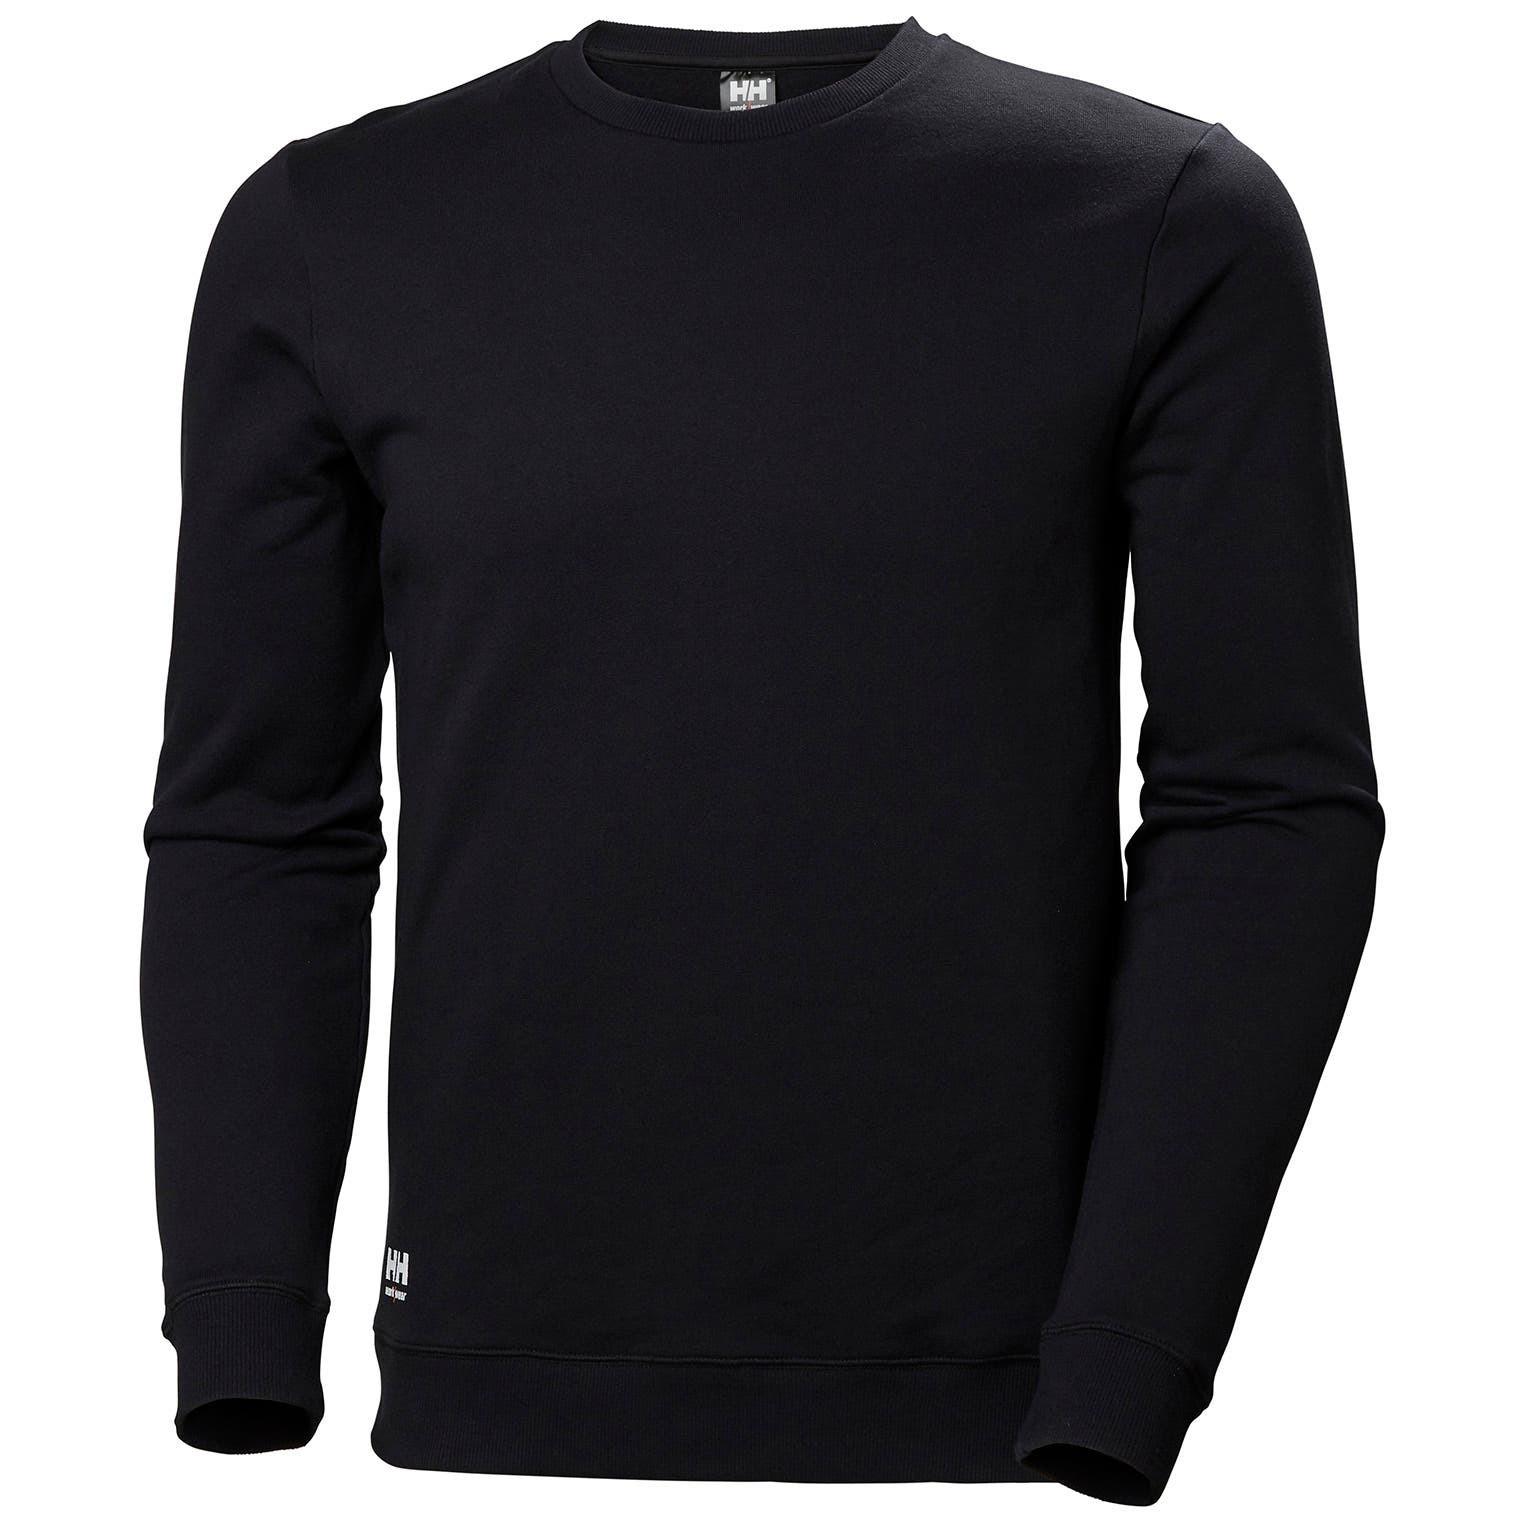 Свитшот Helly Hansen Manchester Sweatshirt - 79208 (Black; S)